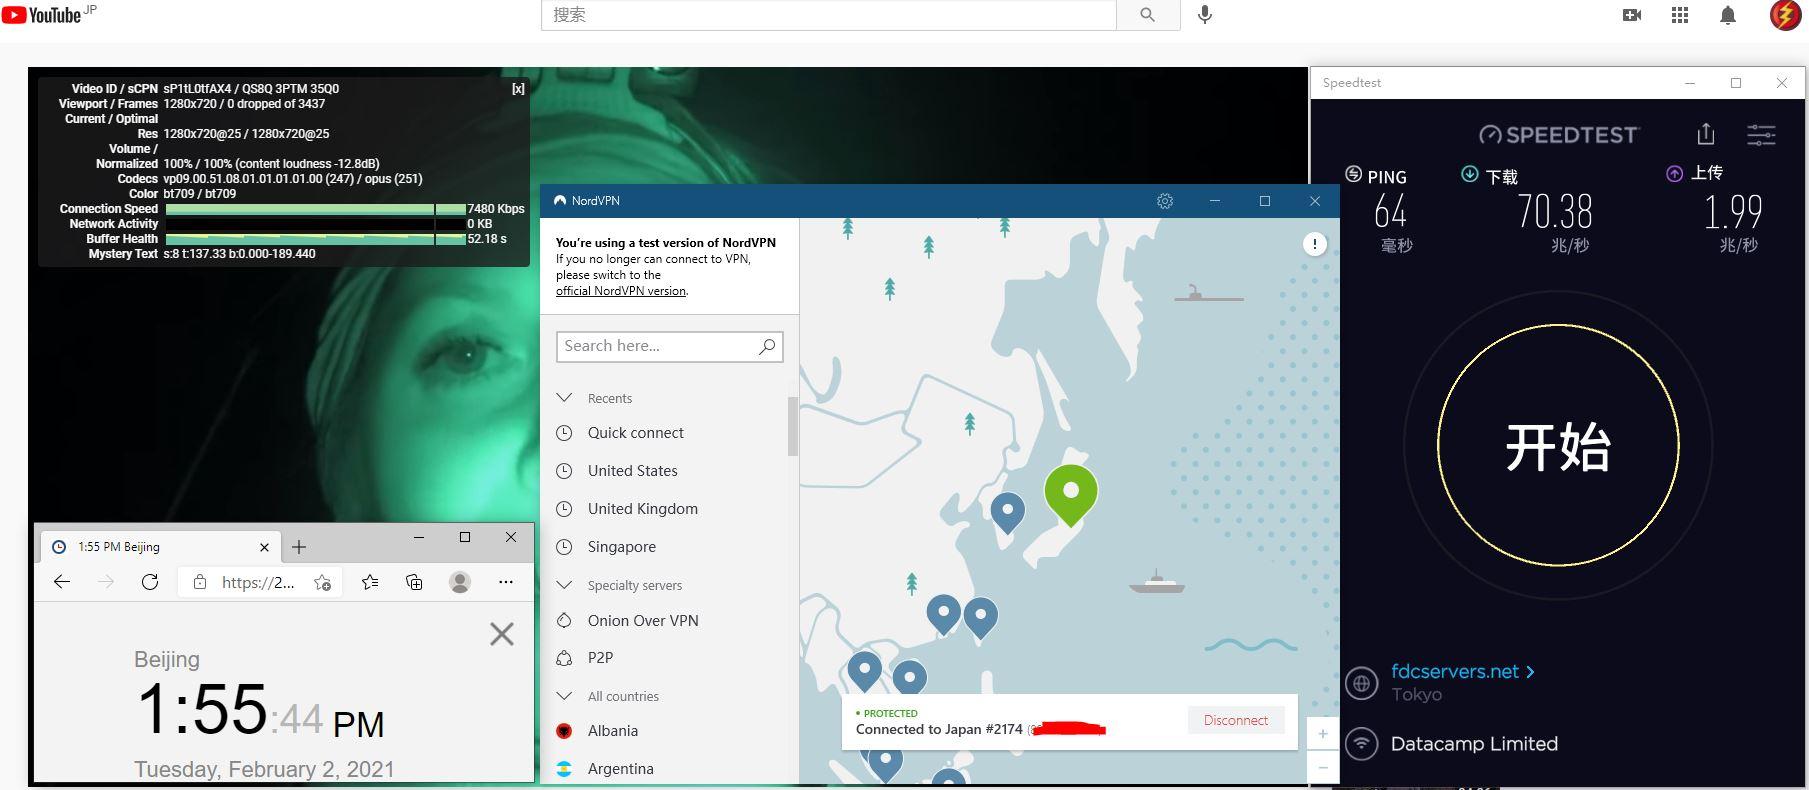 Windows10 NordVPN 中国专用版 Automatic Japan #2174 服务器 中国VPN 翻墙 科学上网 10BEASTS Barry测试 - 20210202